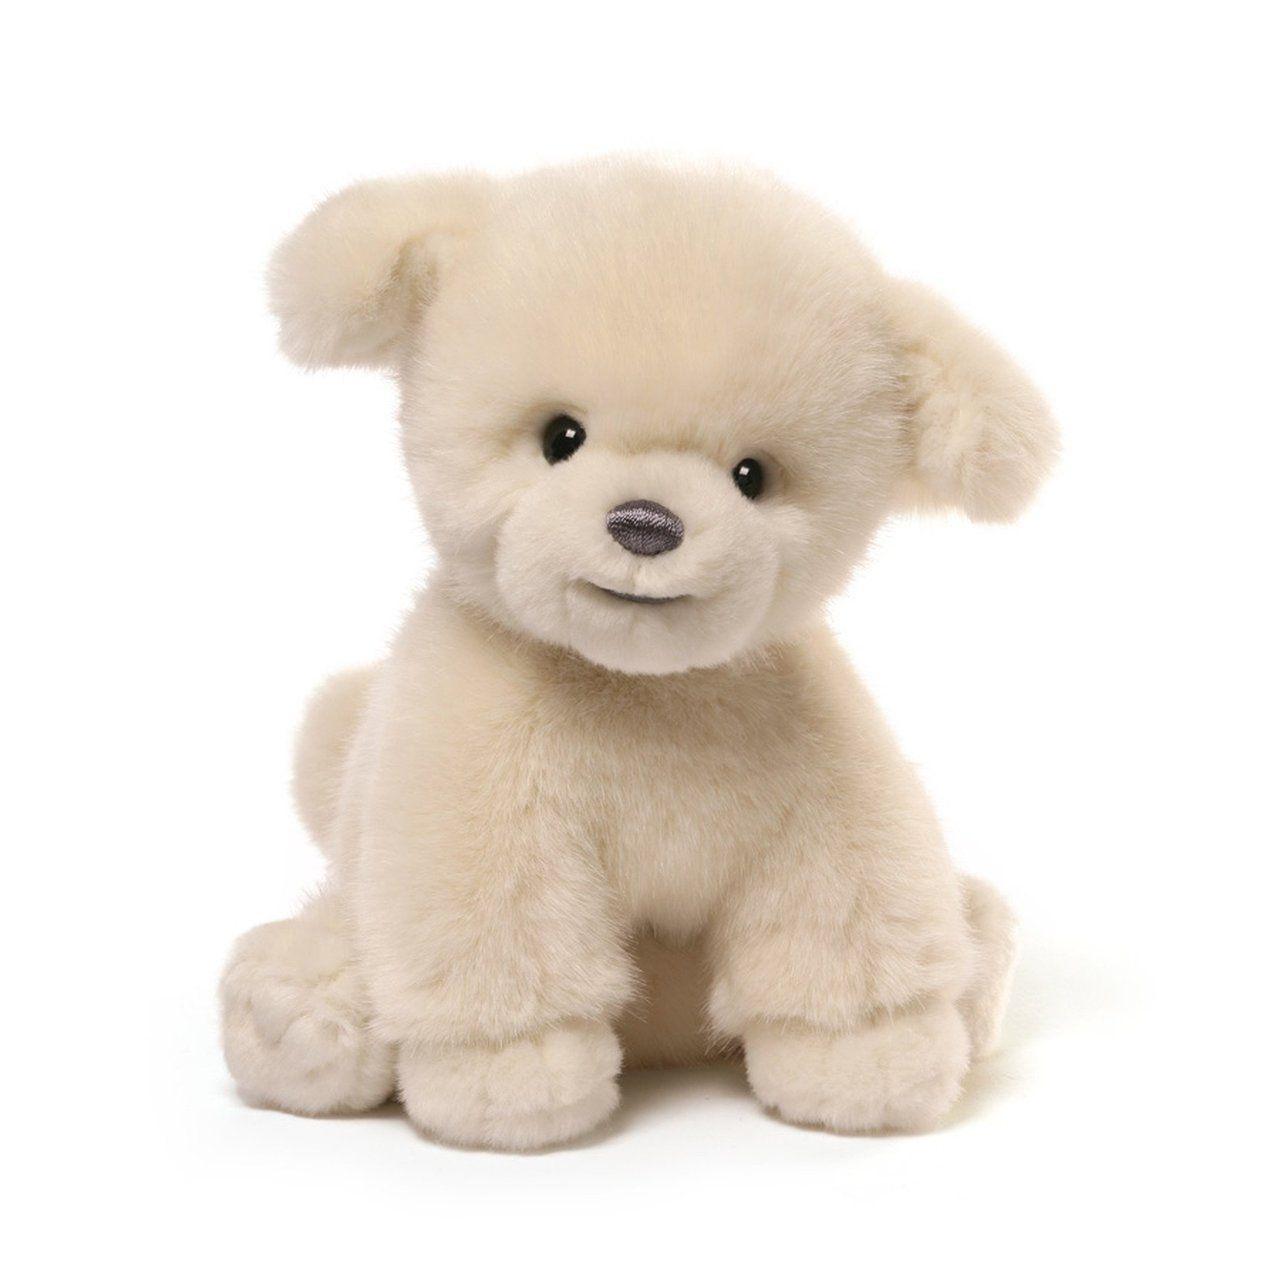 Gund Sadie Dog Stuffed Animal Plush 9 Inch Teddy Bear Stuffed Animal Cute Stuffed Animals Dog Stuffed Animal [ 1280 x 1280 Pixel ]